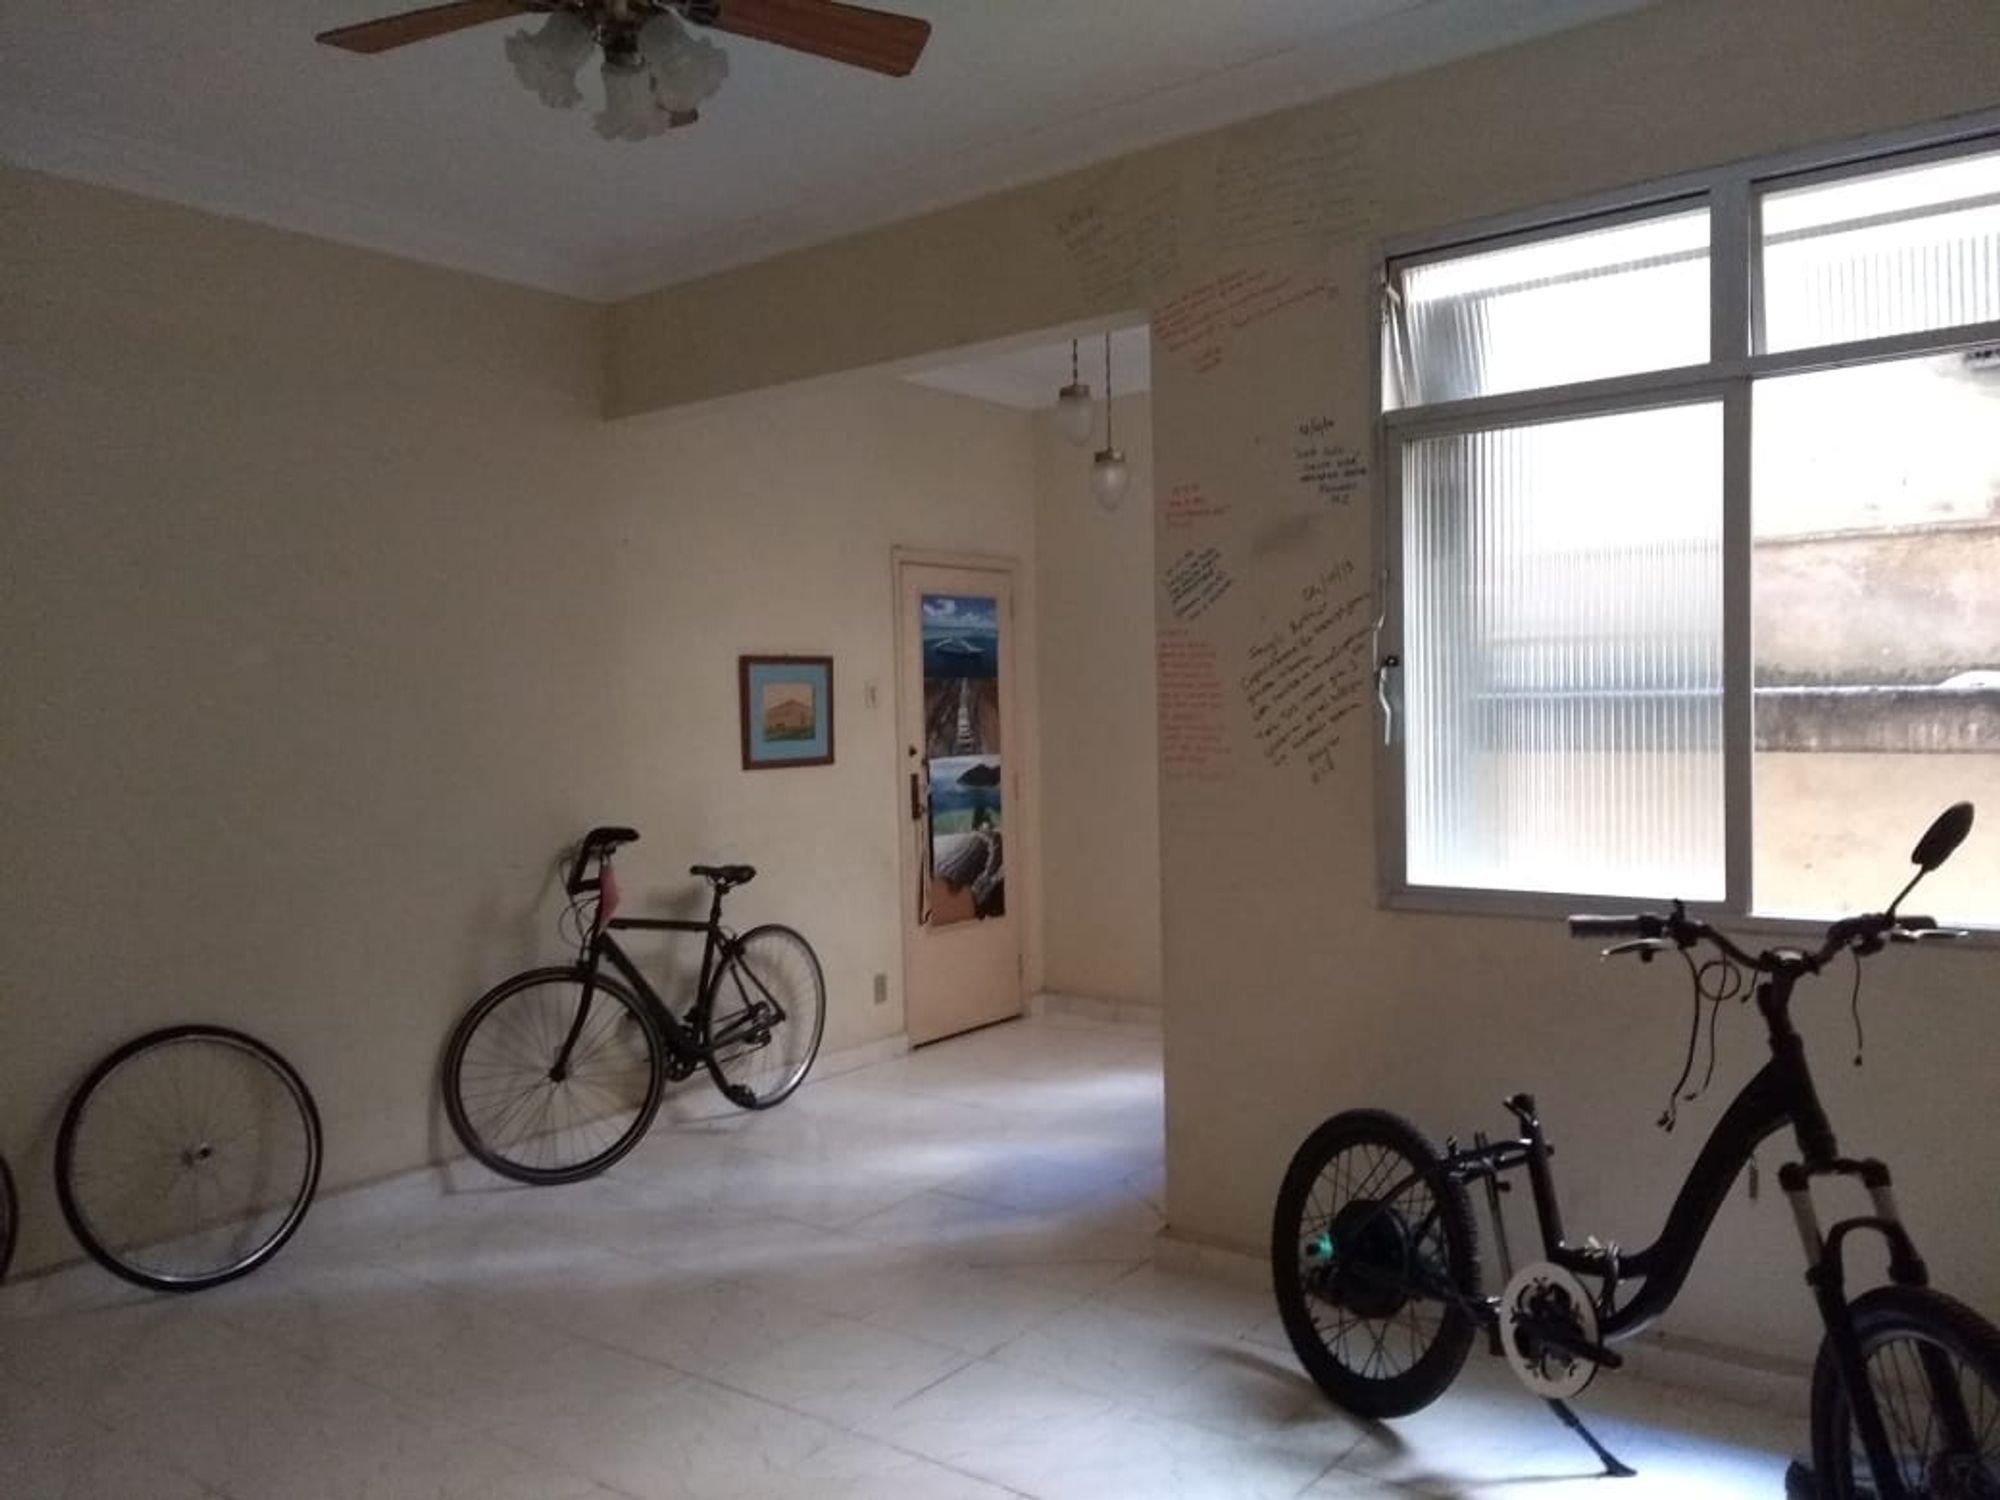 Foto de Sala com bicicleta